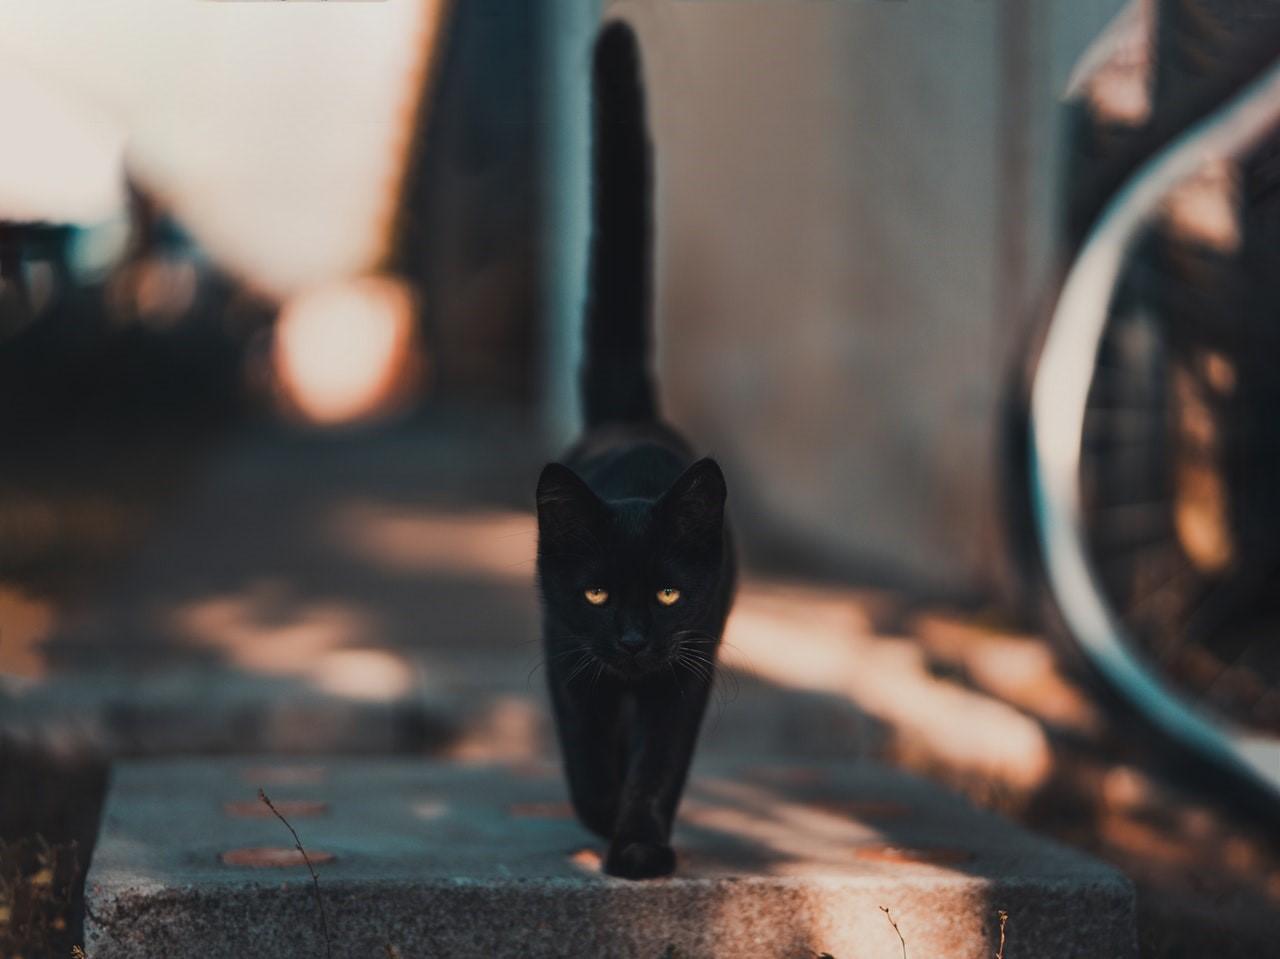 Black cat, superstition, superstitious